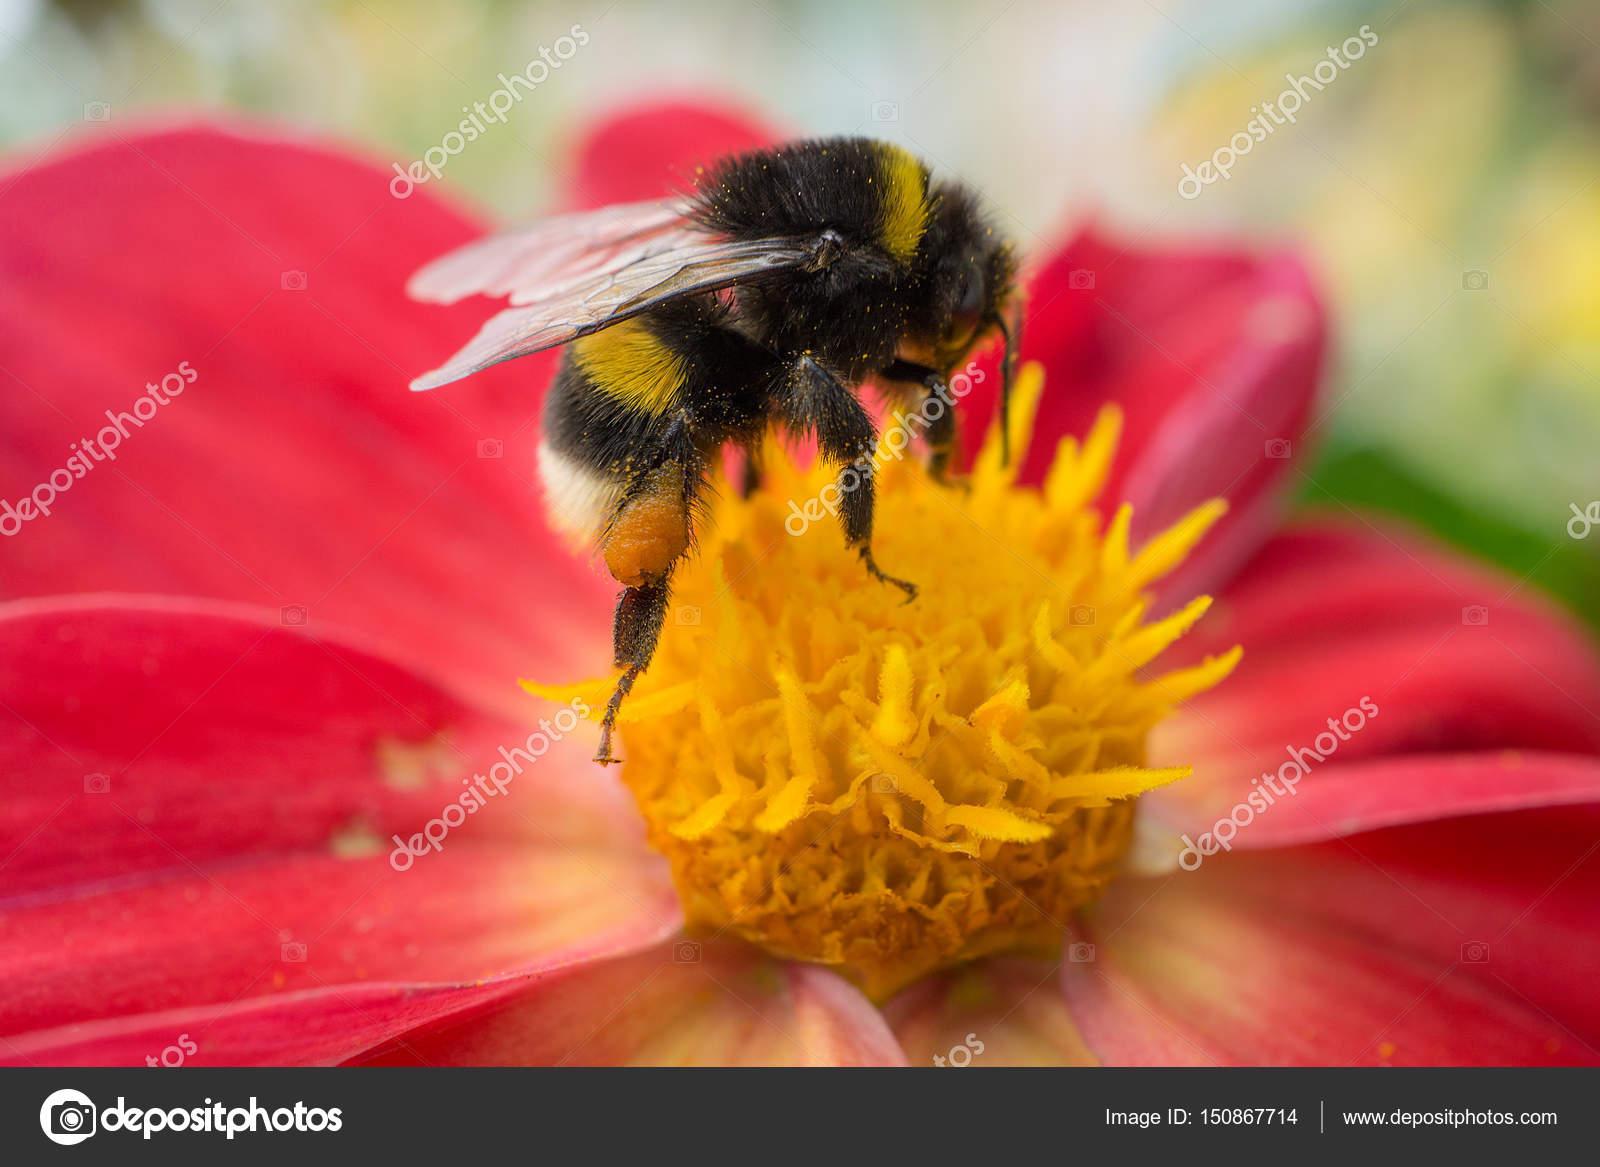 Bee sitting on beautiful red flower stock photo pavellanenko bee sitting on beautiful red flower stock photo izmirmasajfo